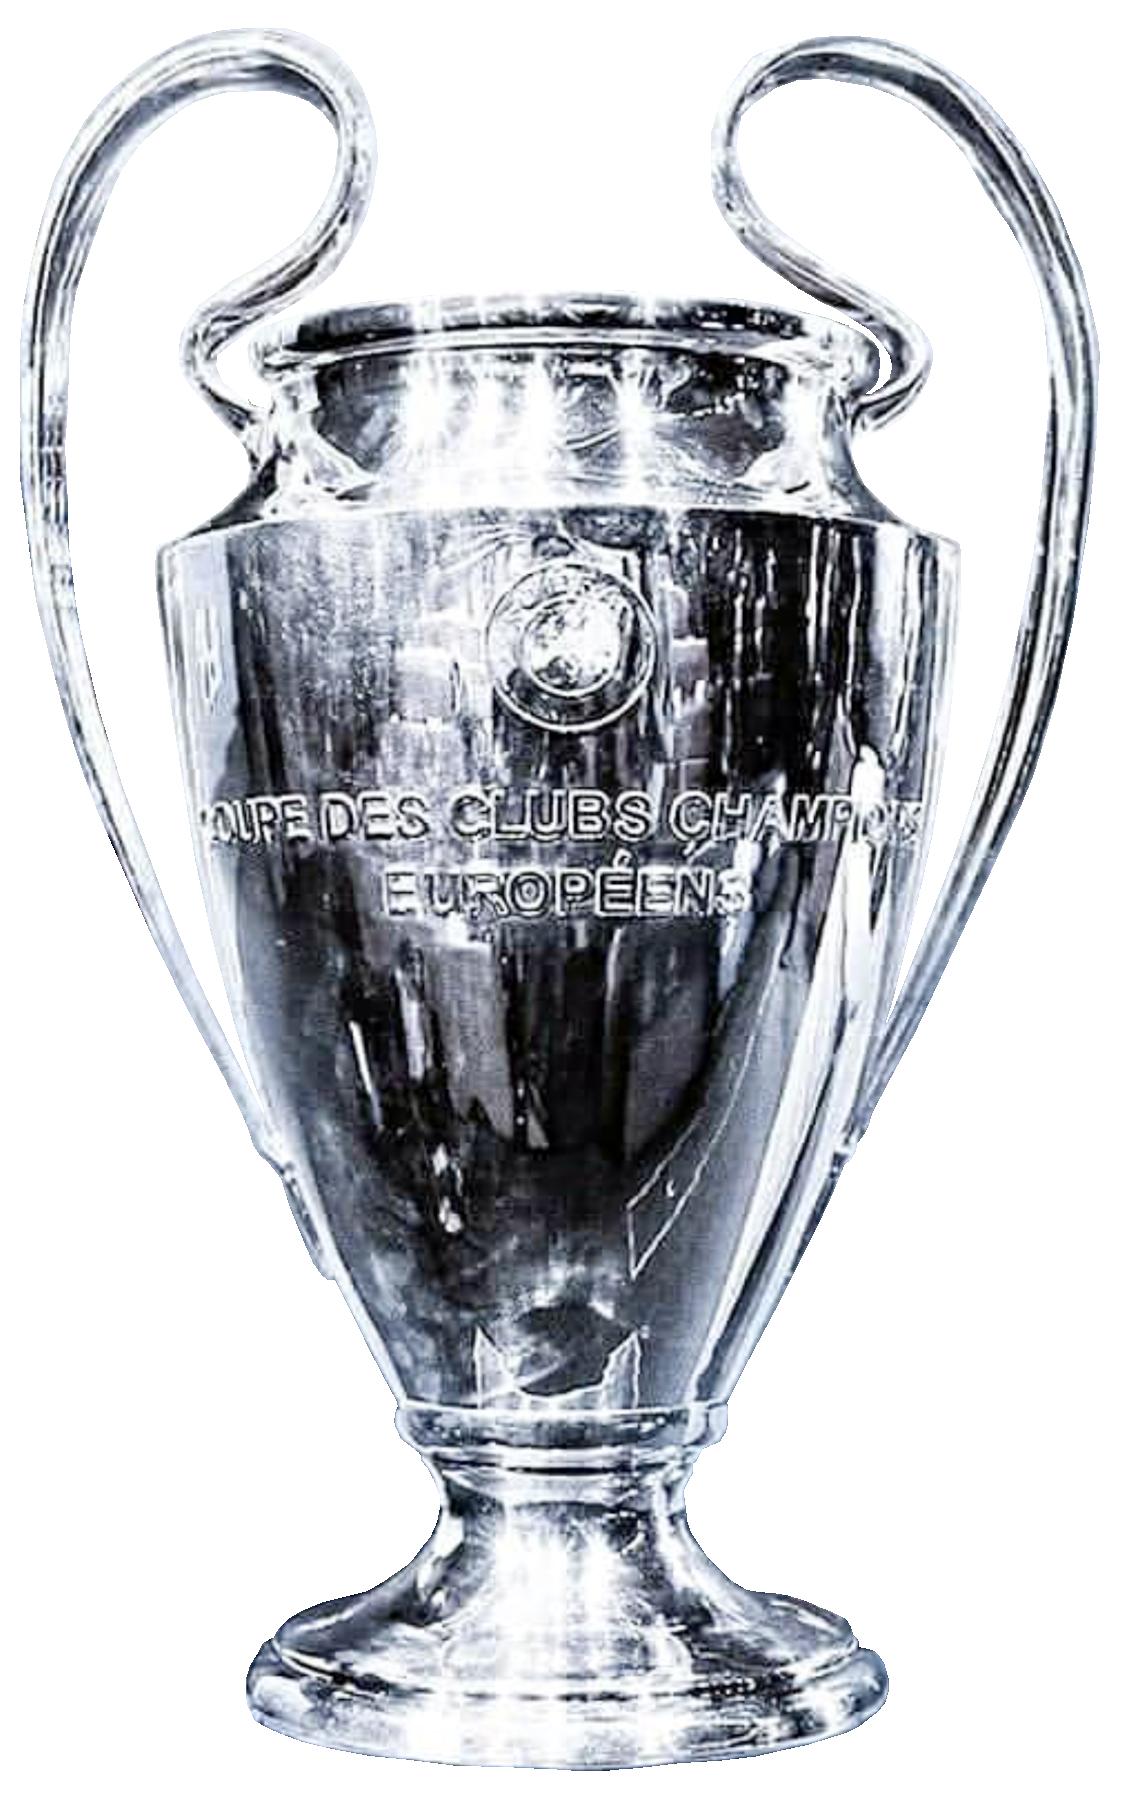 UEFA Champions League Winners Cup | Trofeu futebol, Taças ...